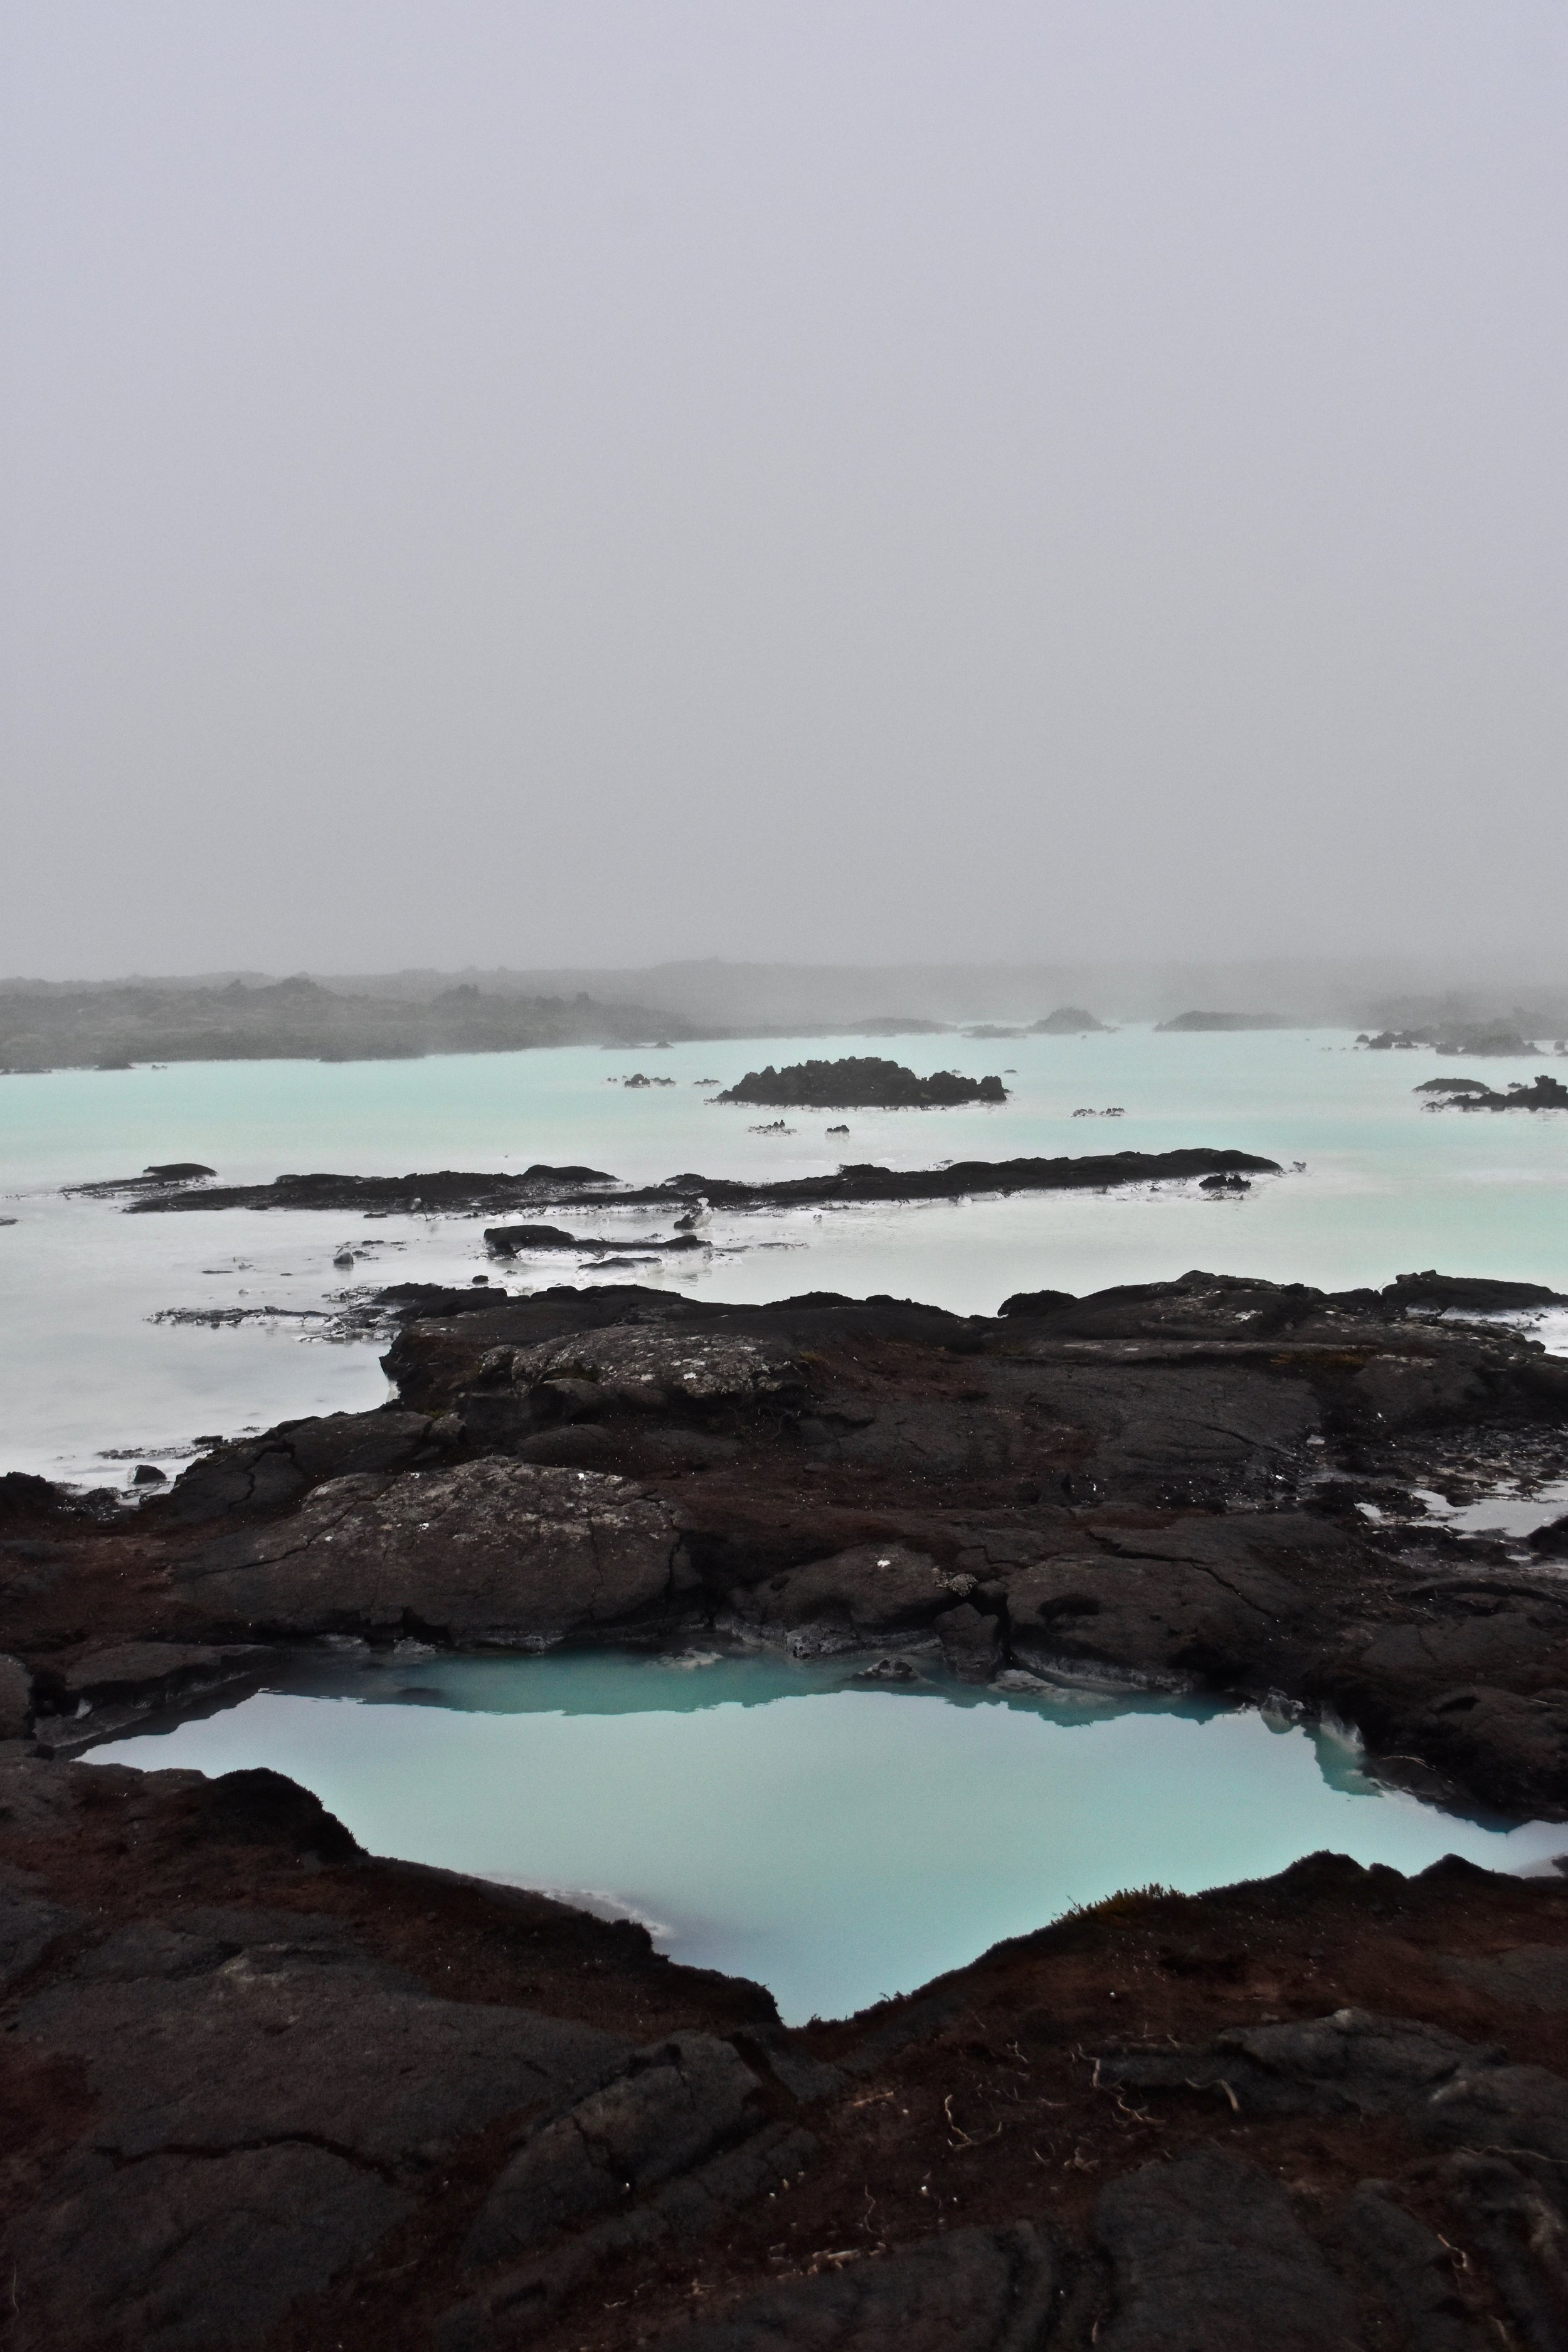 The Blue Lagoon near Reykjavik, Iceland